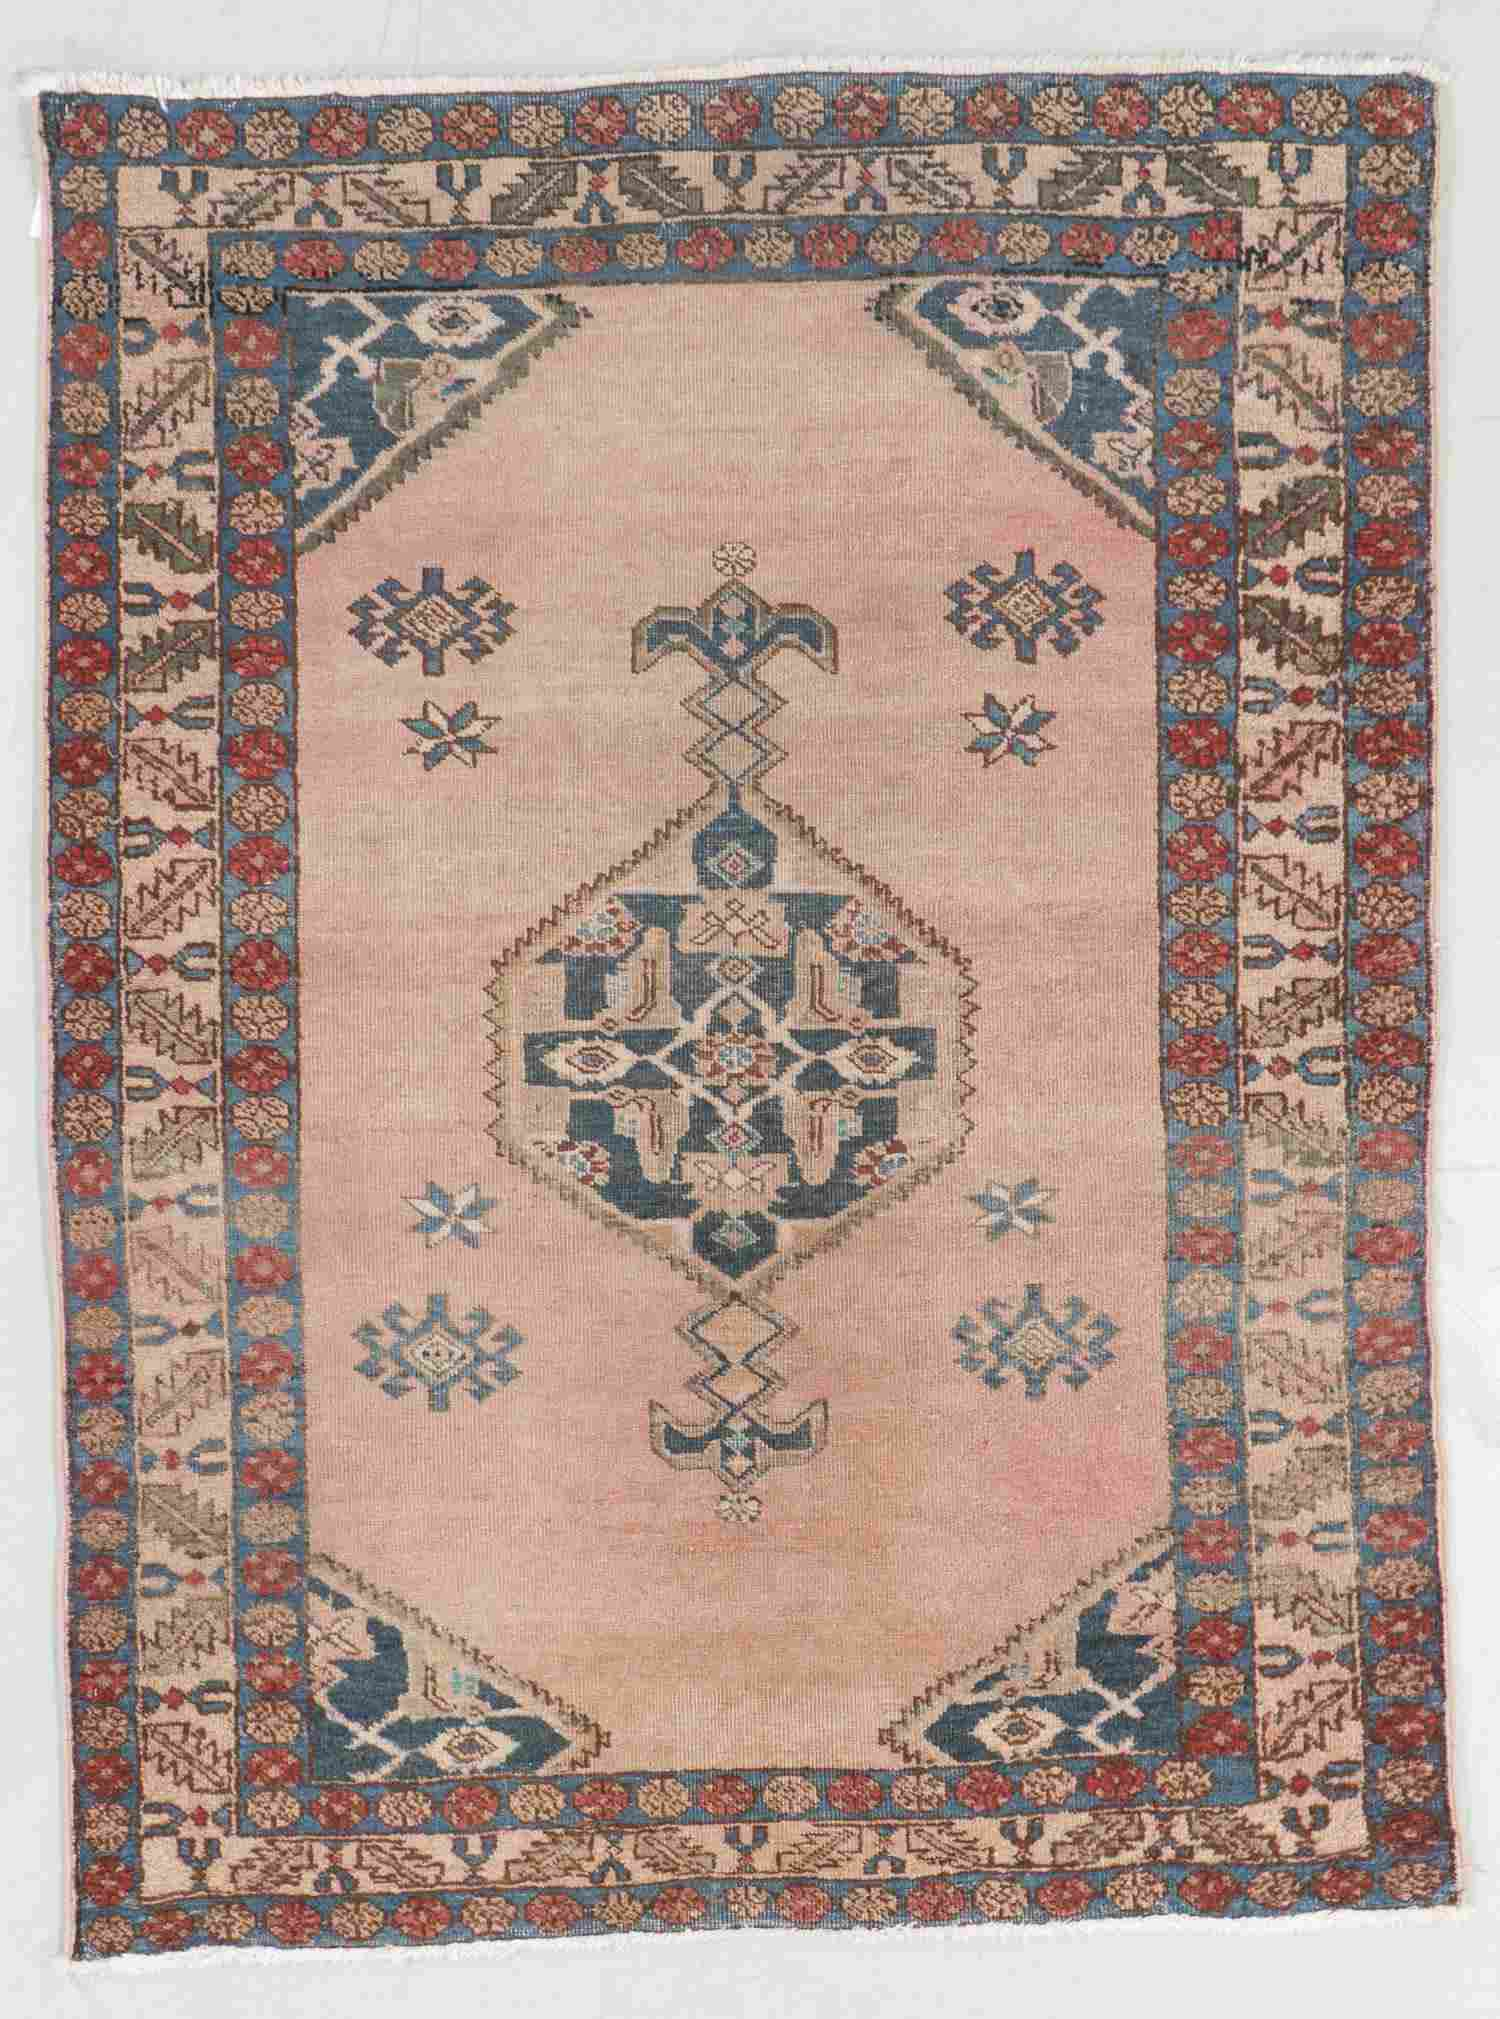 Antique Malayer Rug, Persia: 3'9'' x 4'11''